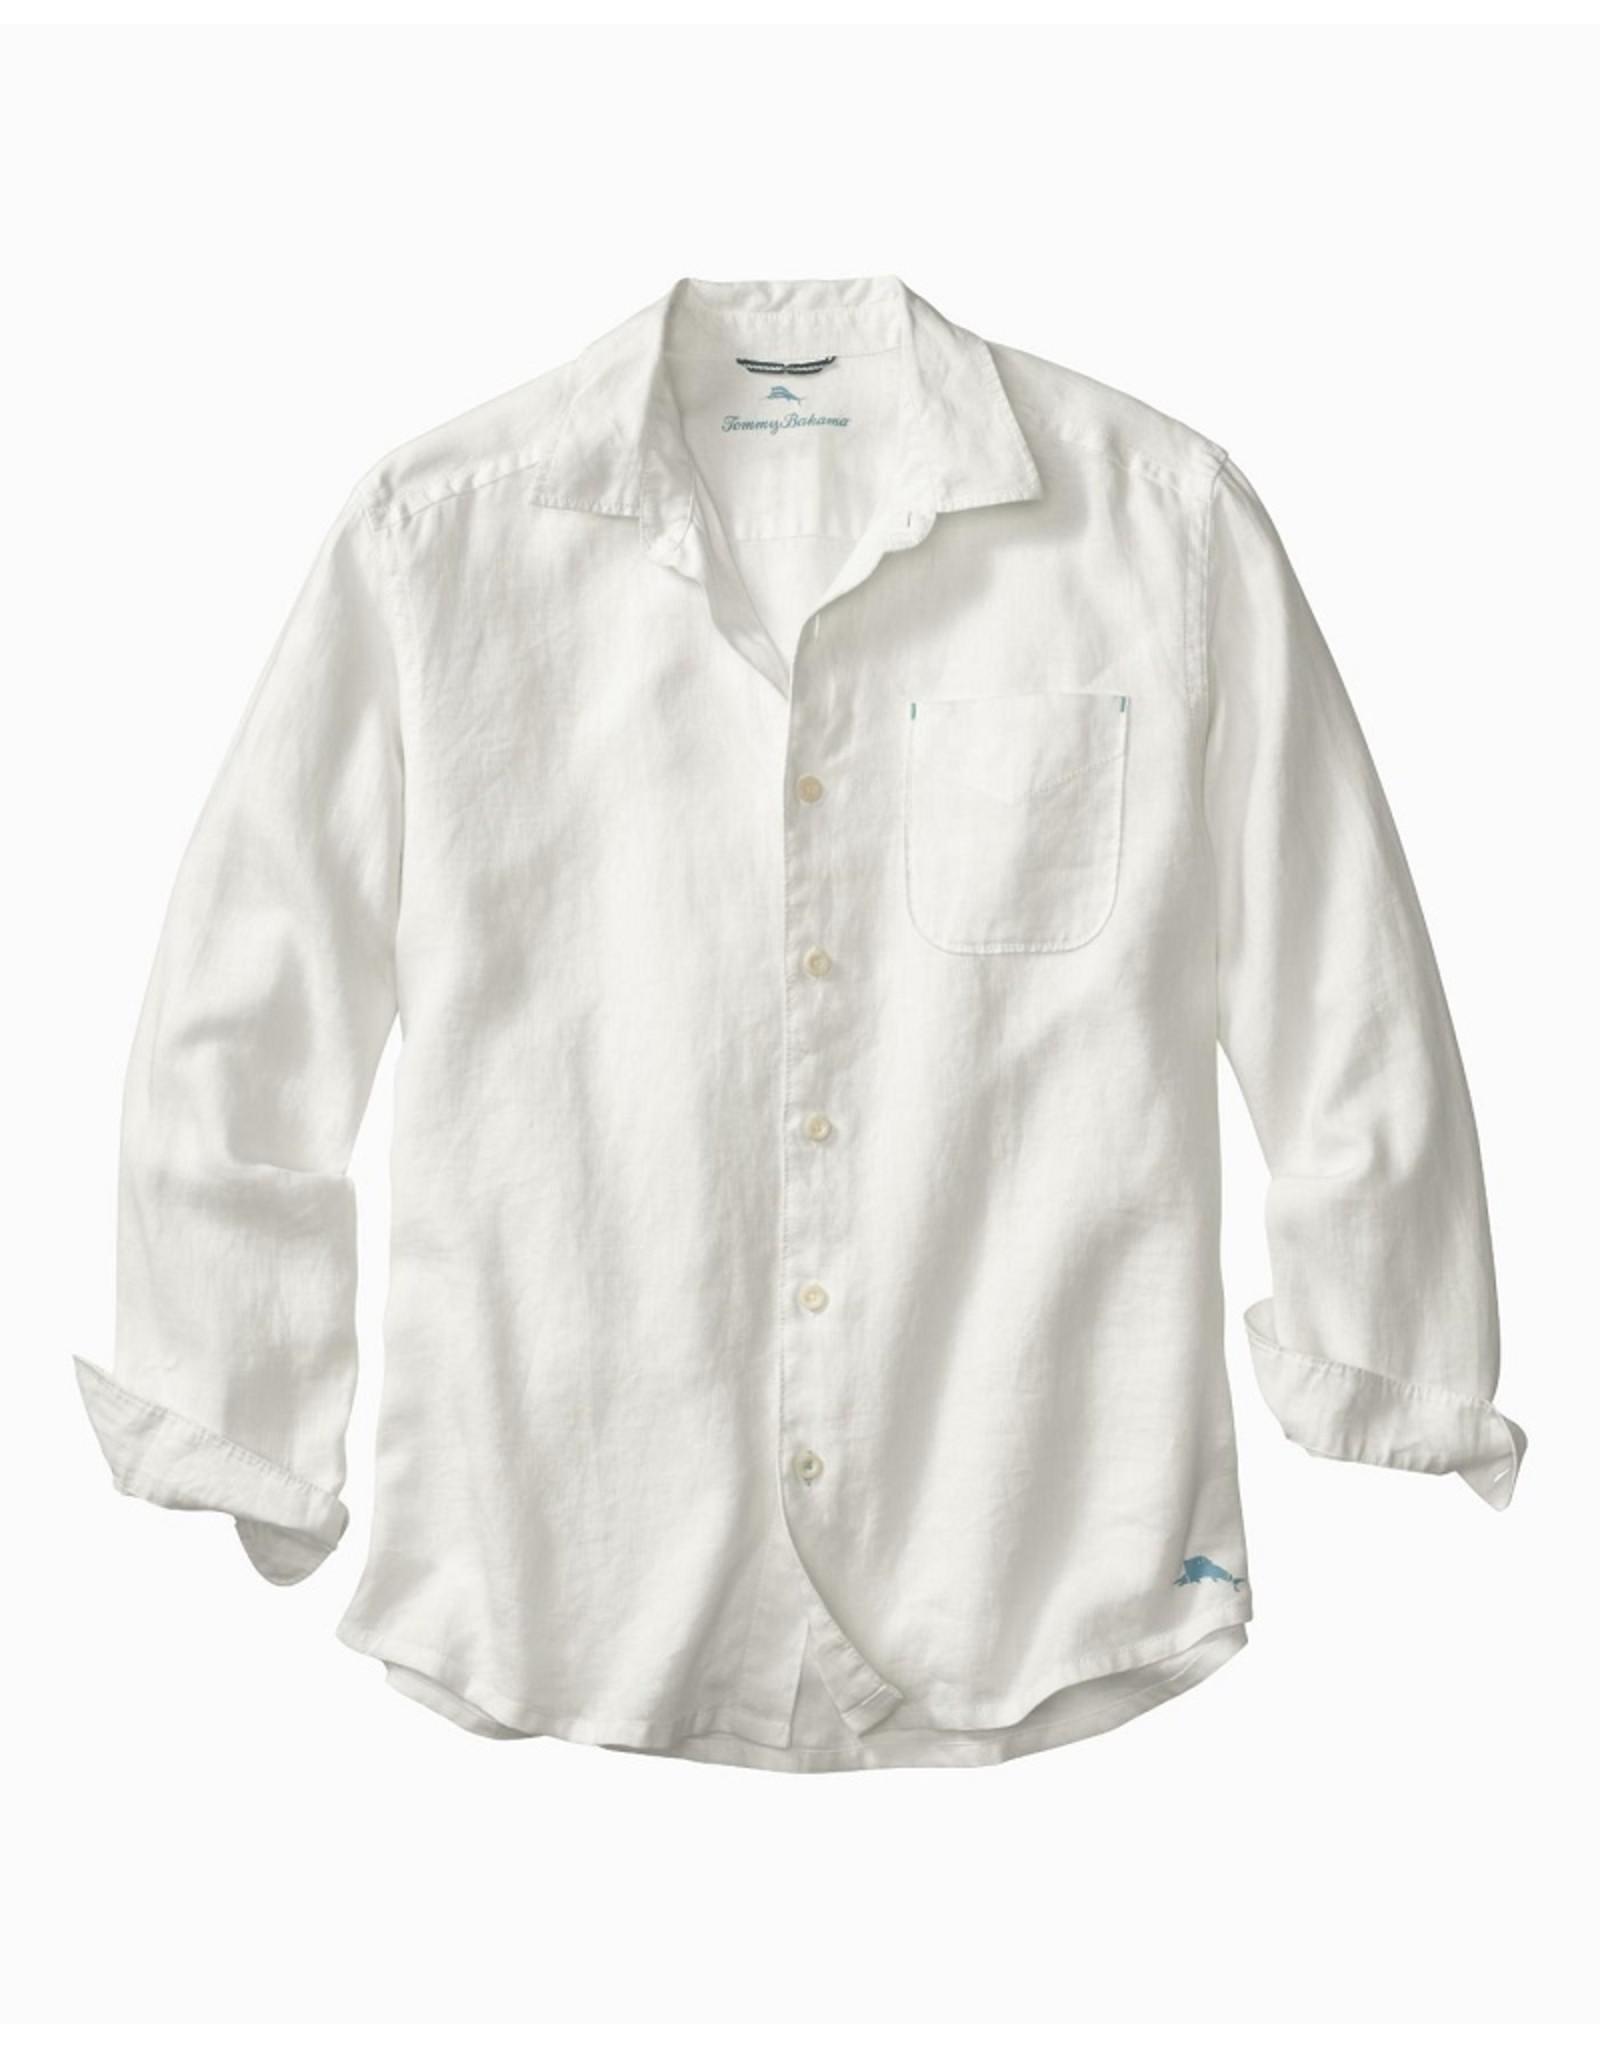 Tommy Bahama Tommy Bahama Sea Glass Breezer Linen Long Sleeve